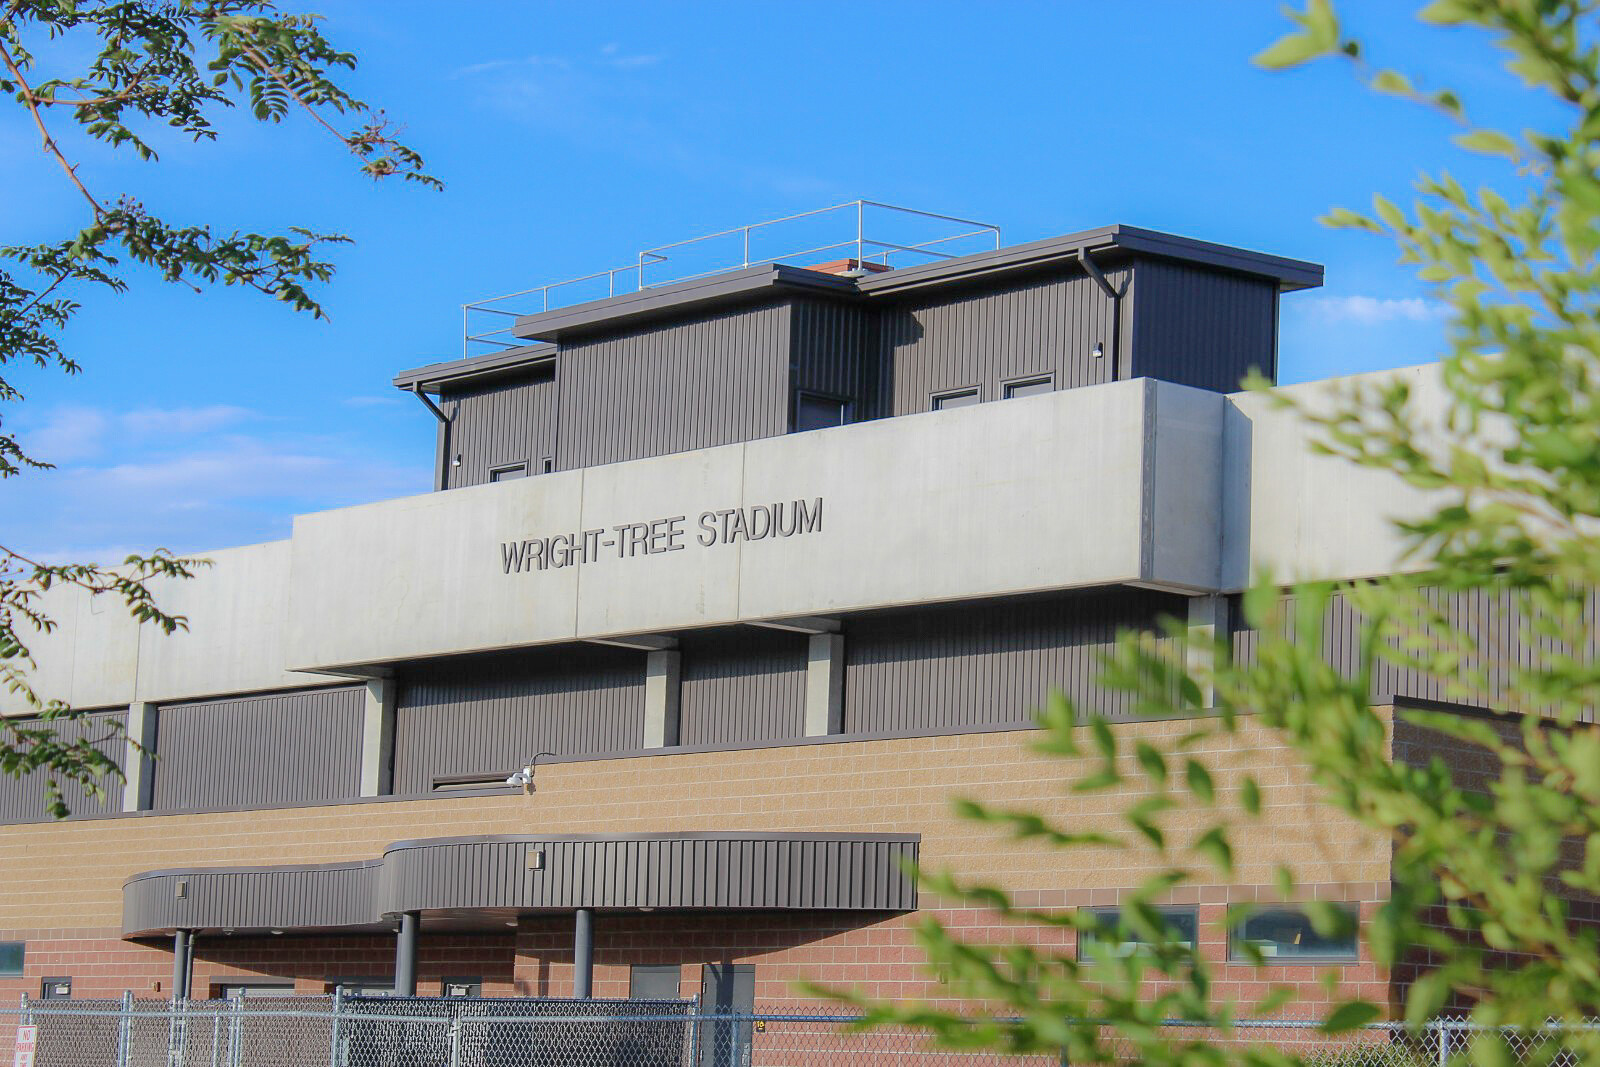 Wright-Tree Stadium